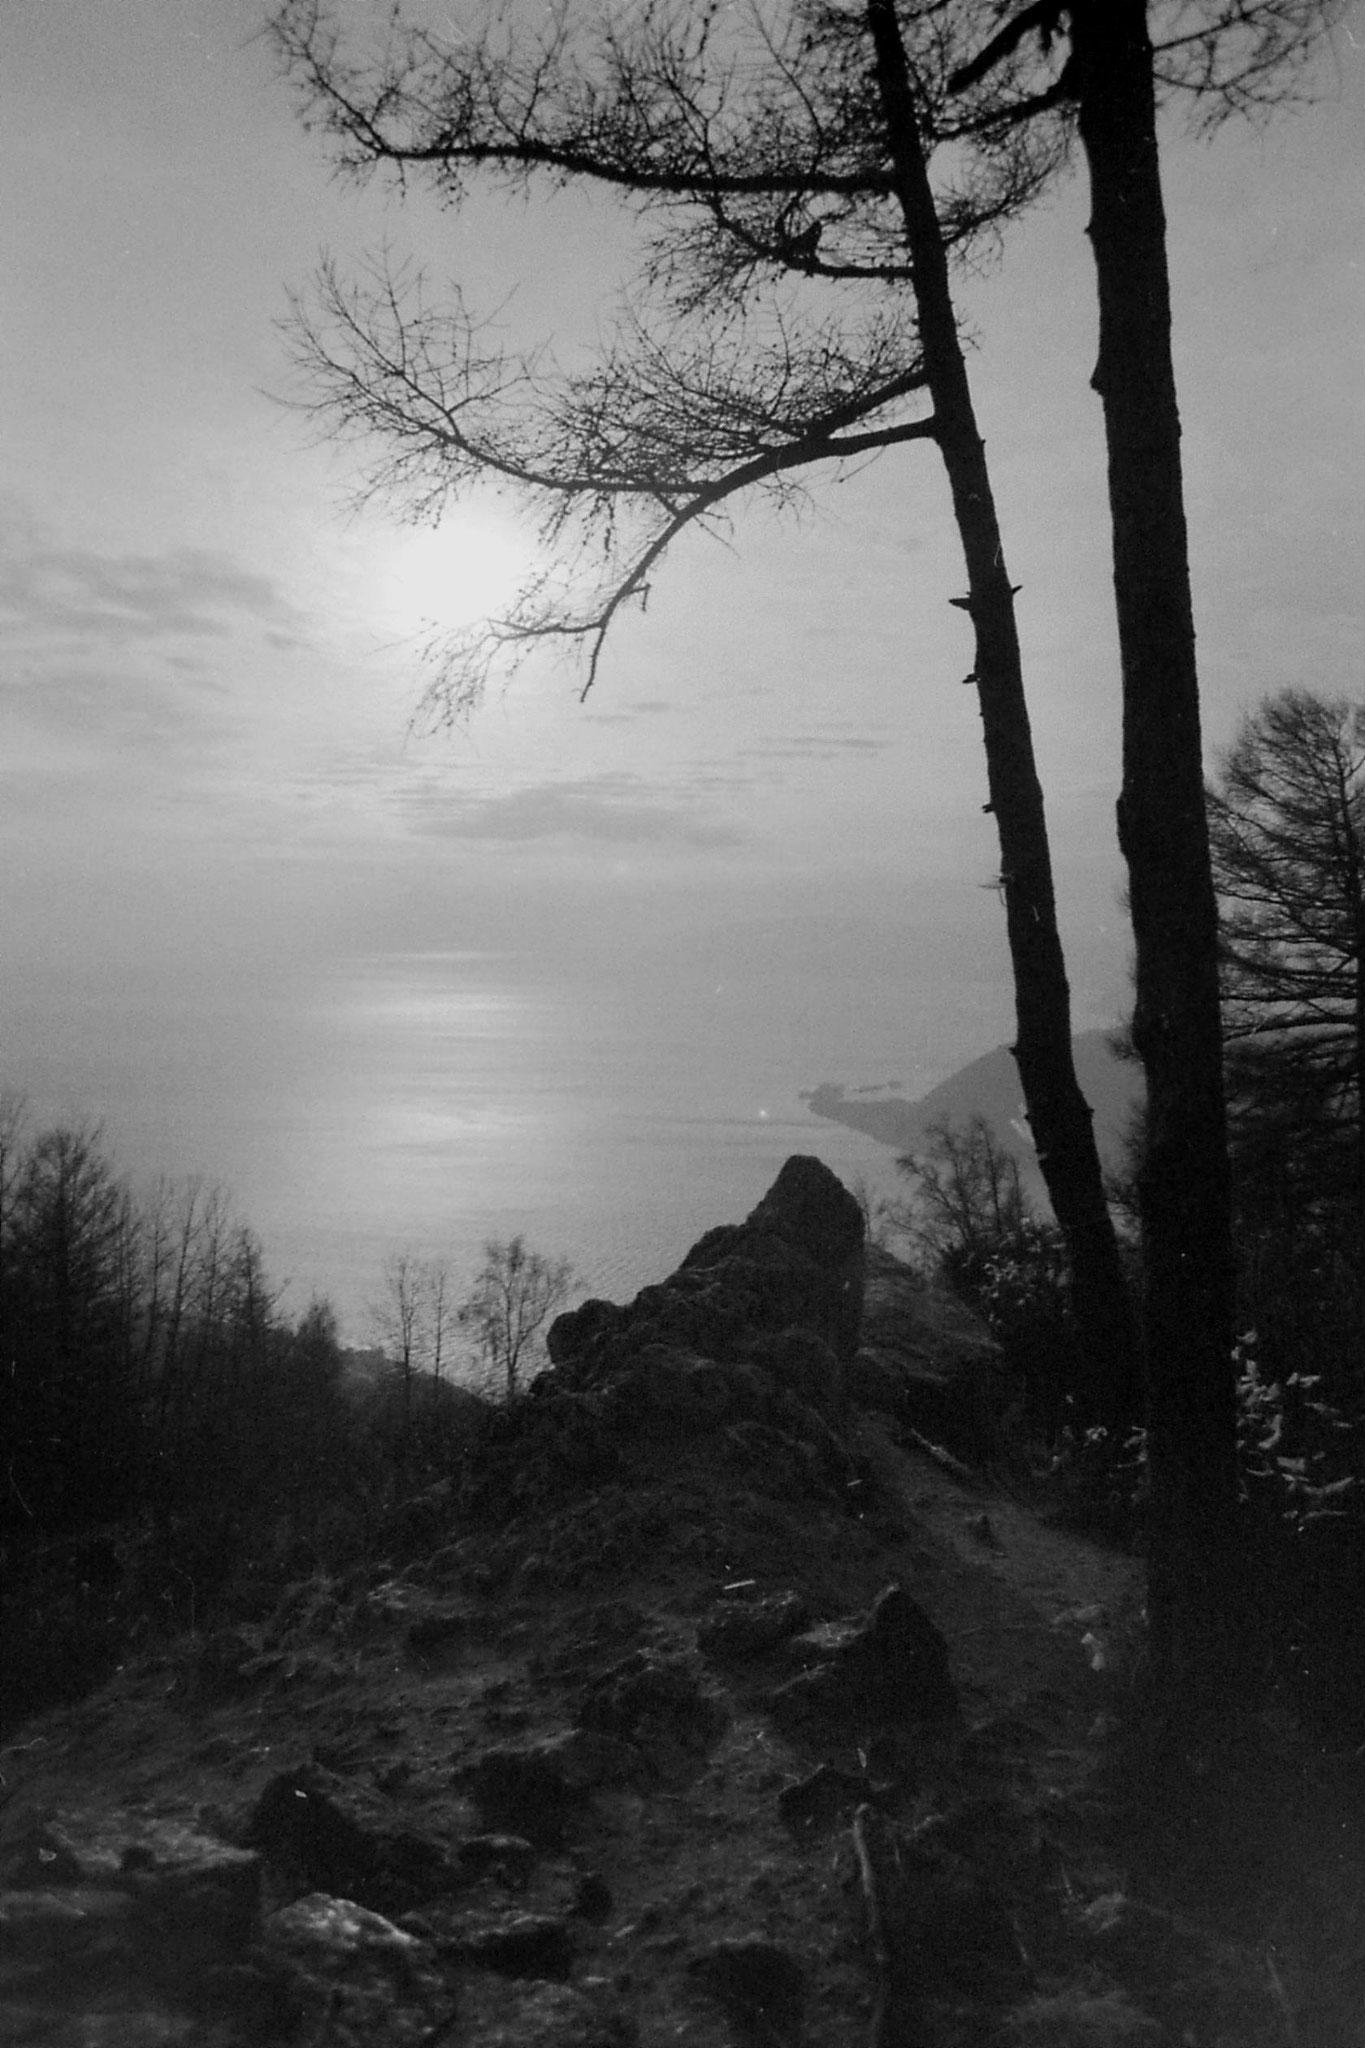 23/10/1988: 18: Lake Baikal - scraps of material on trees